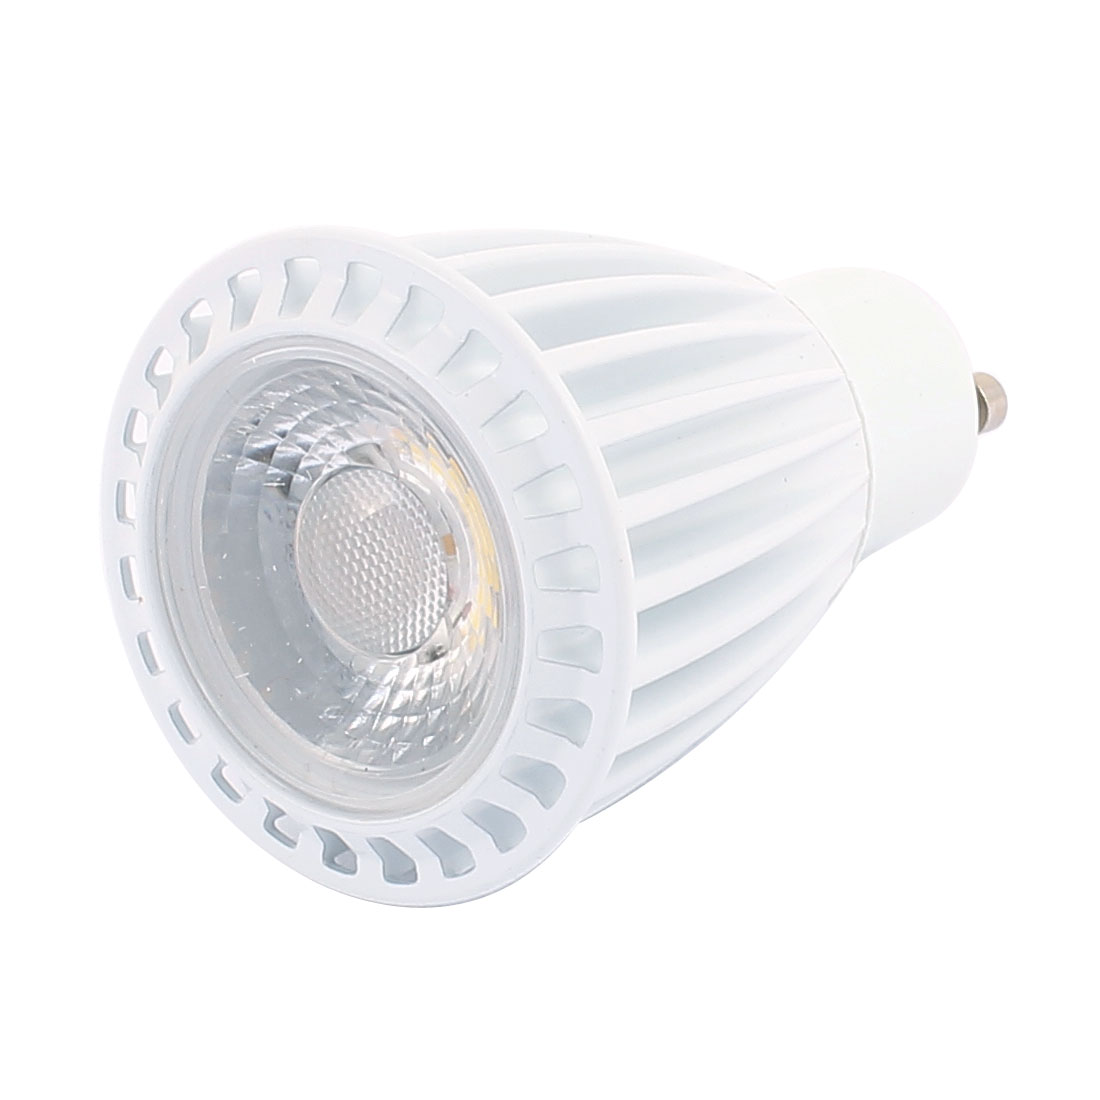 AC85-265V-7W-GU10-Base-COB-LED-Spotlight-Bulb-Downlight-Energy-Saving-Pure-White